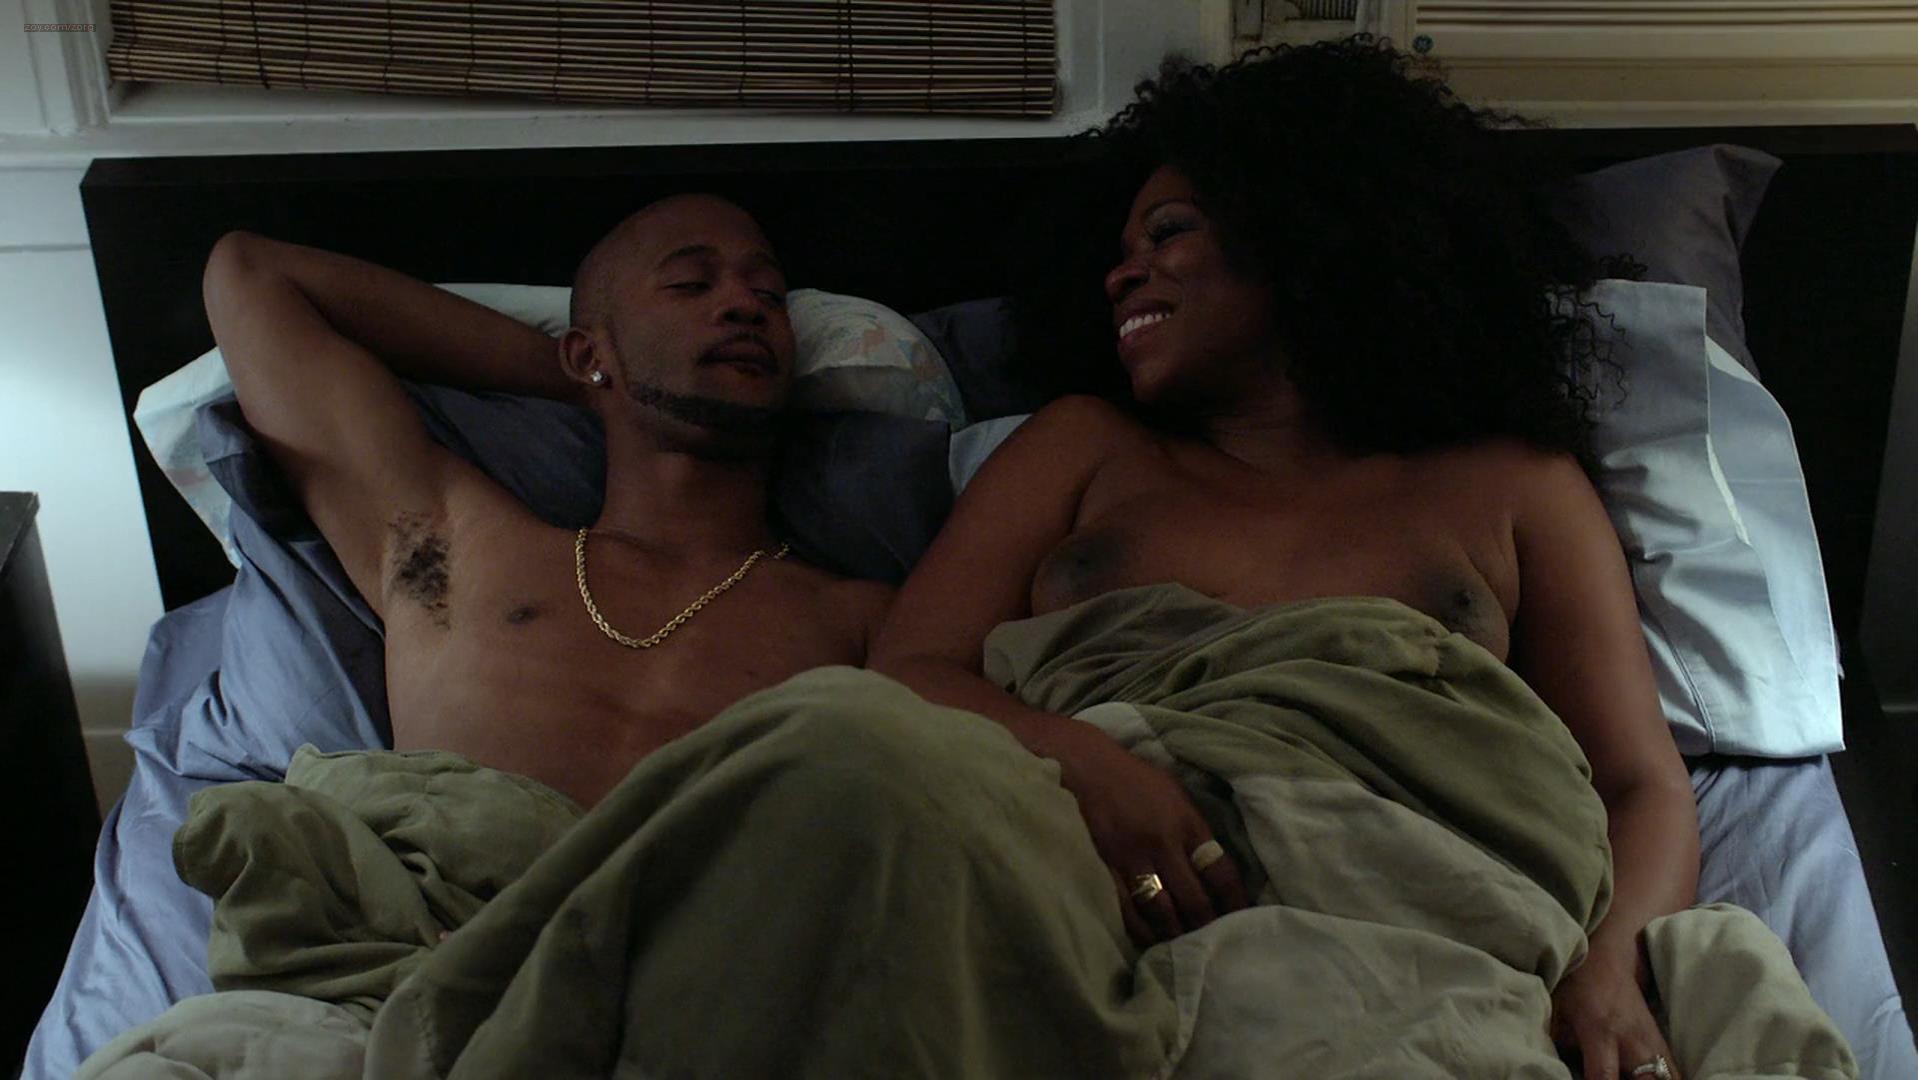 Lorraine Toussaint nude - Orange is the New Black s02e12 (2014)